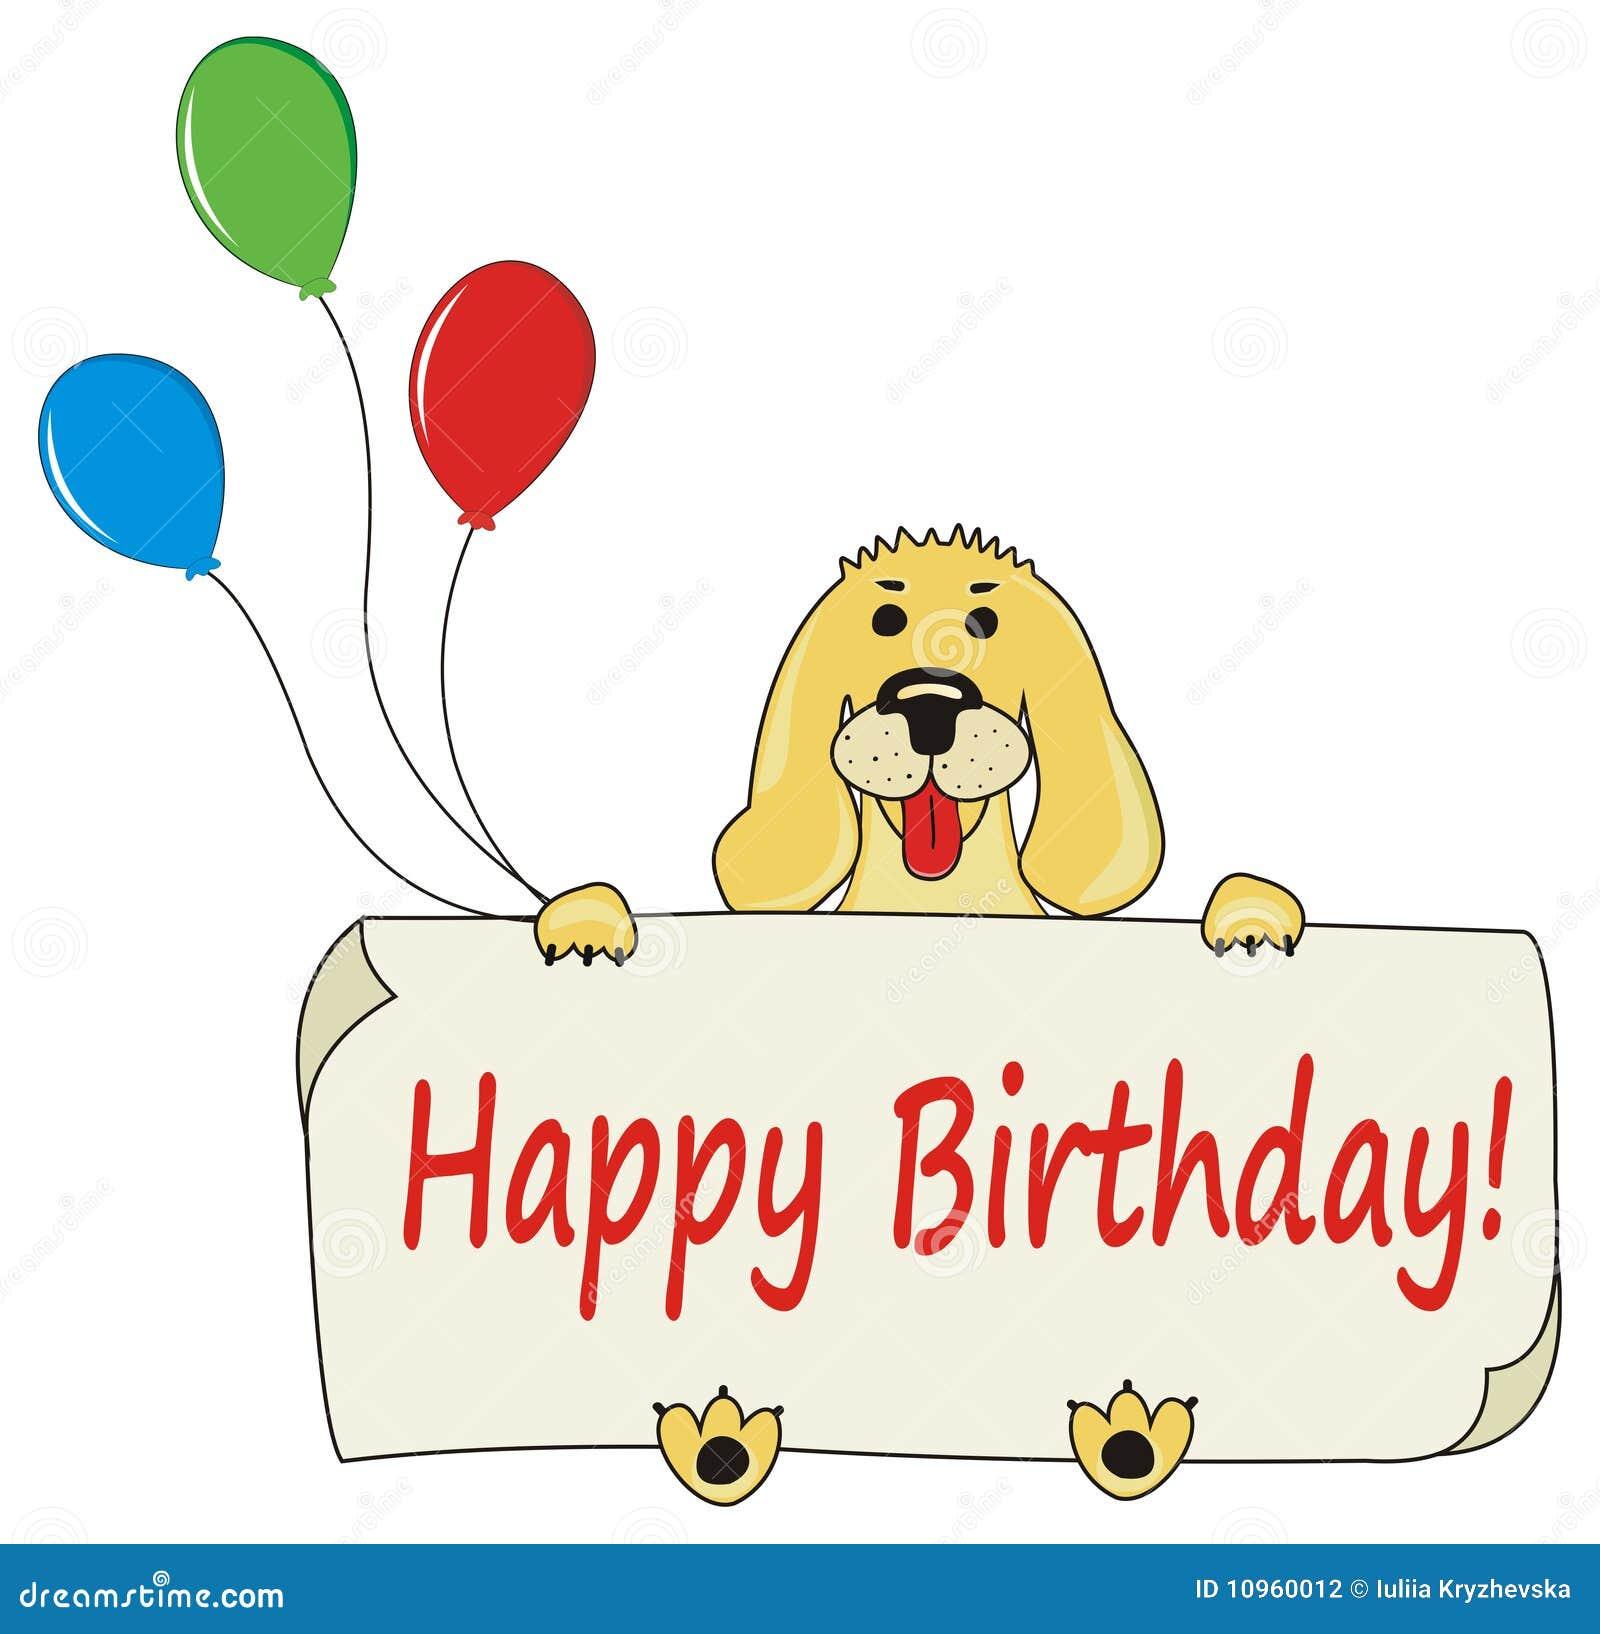 Happy Birthday Cartoon Dog Stock Illustrations 3 072 Happy Birthday Cartoon Dog Stock Illustrations Vectors Clipart Dreamstime